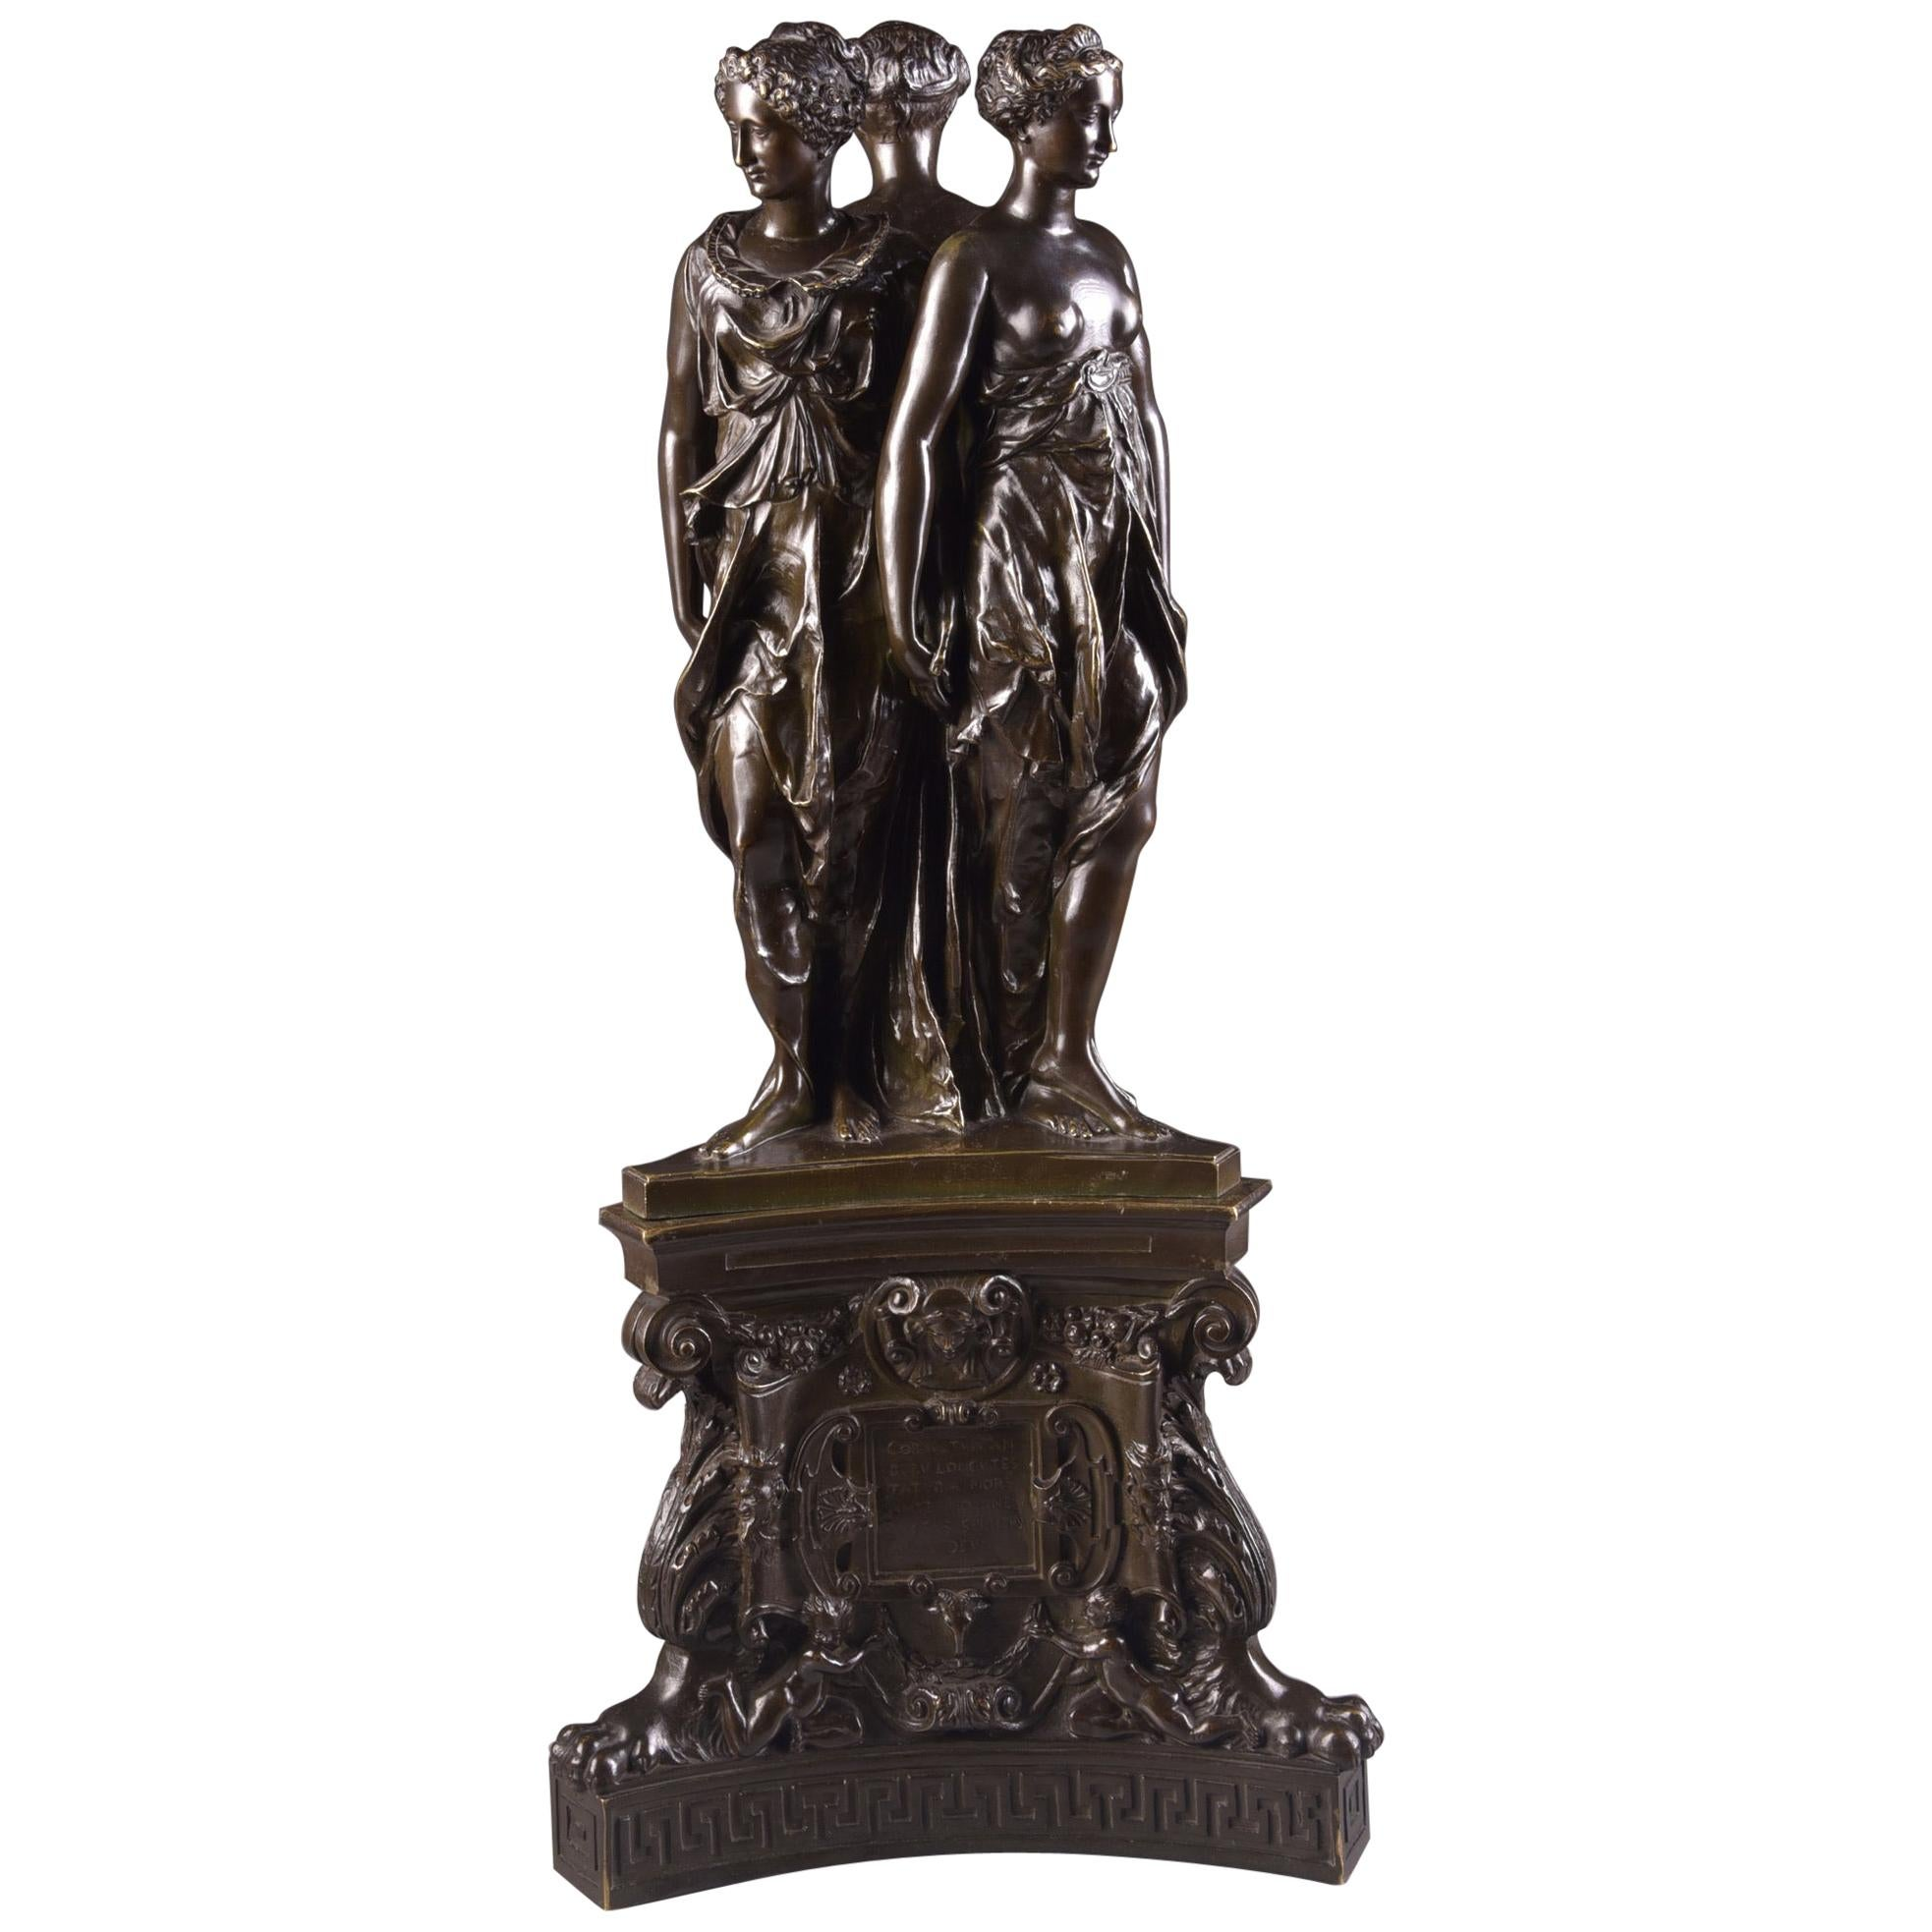 Bronze Group Sculpture, the Three Graces, 19th Century after Pilon